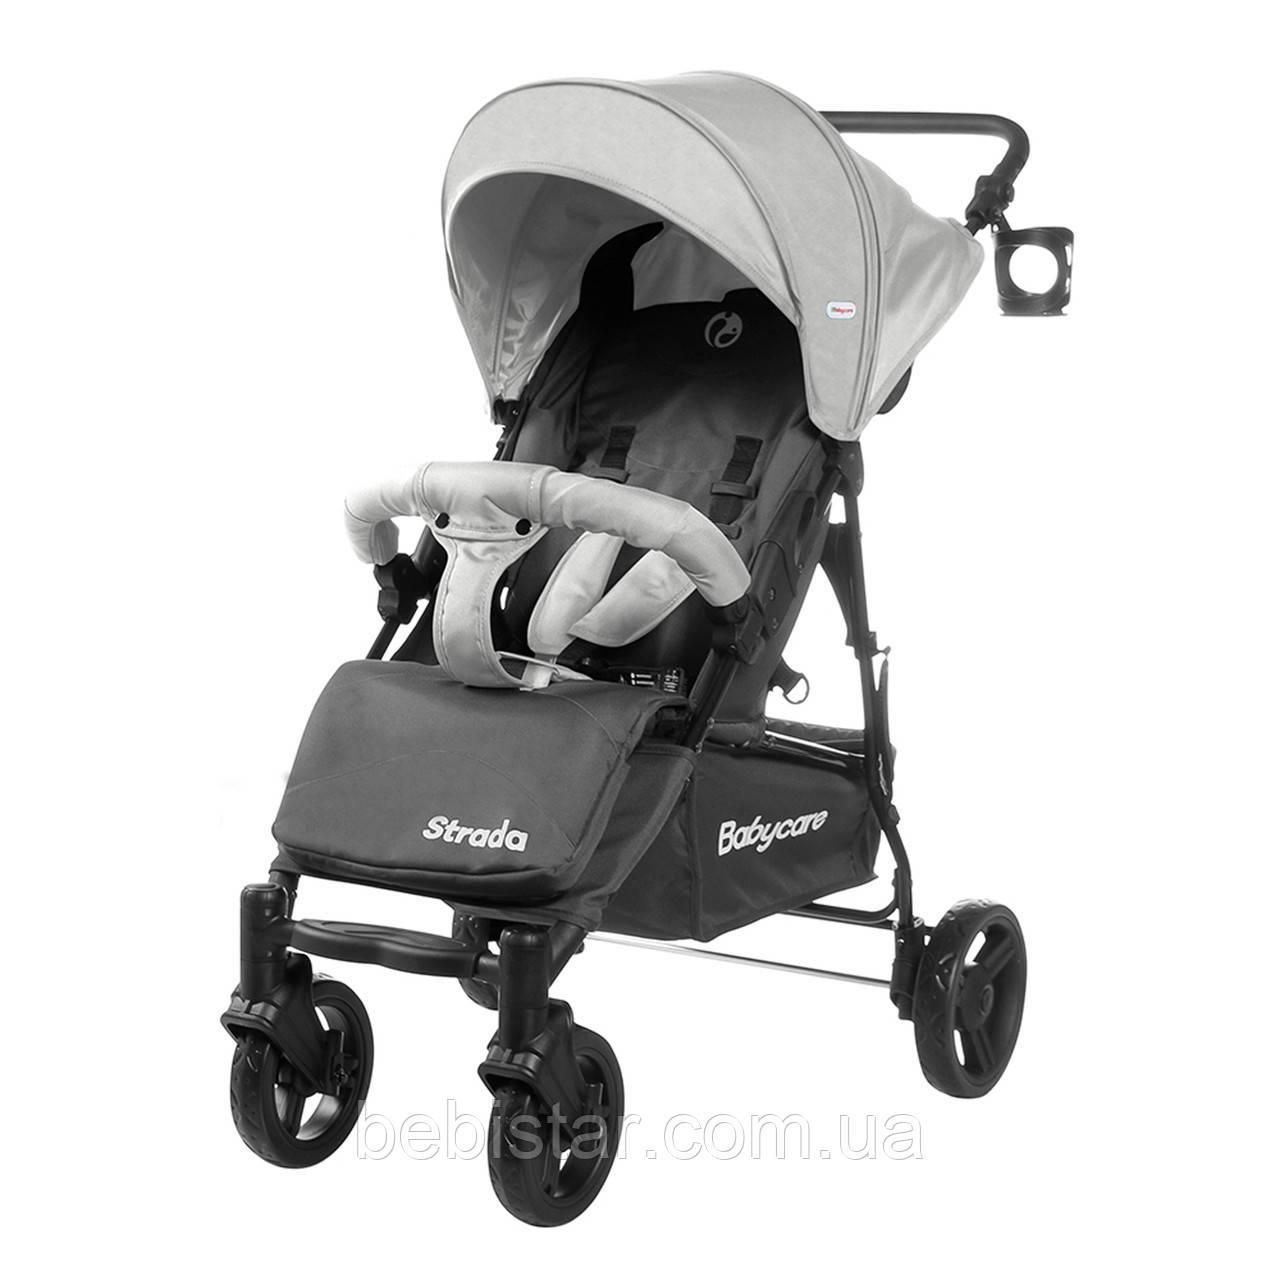 Прогулочная коляска серая Babycare Strada CRL-7305 Cloud Grey